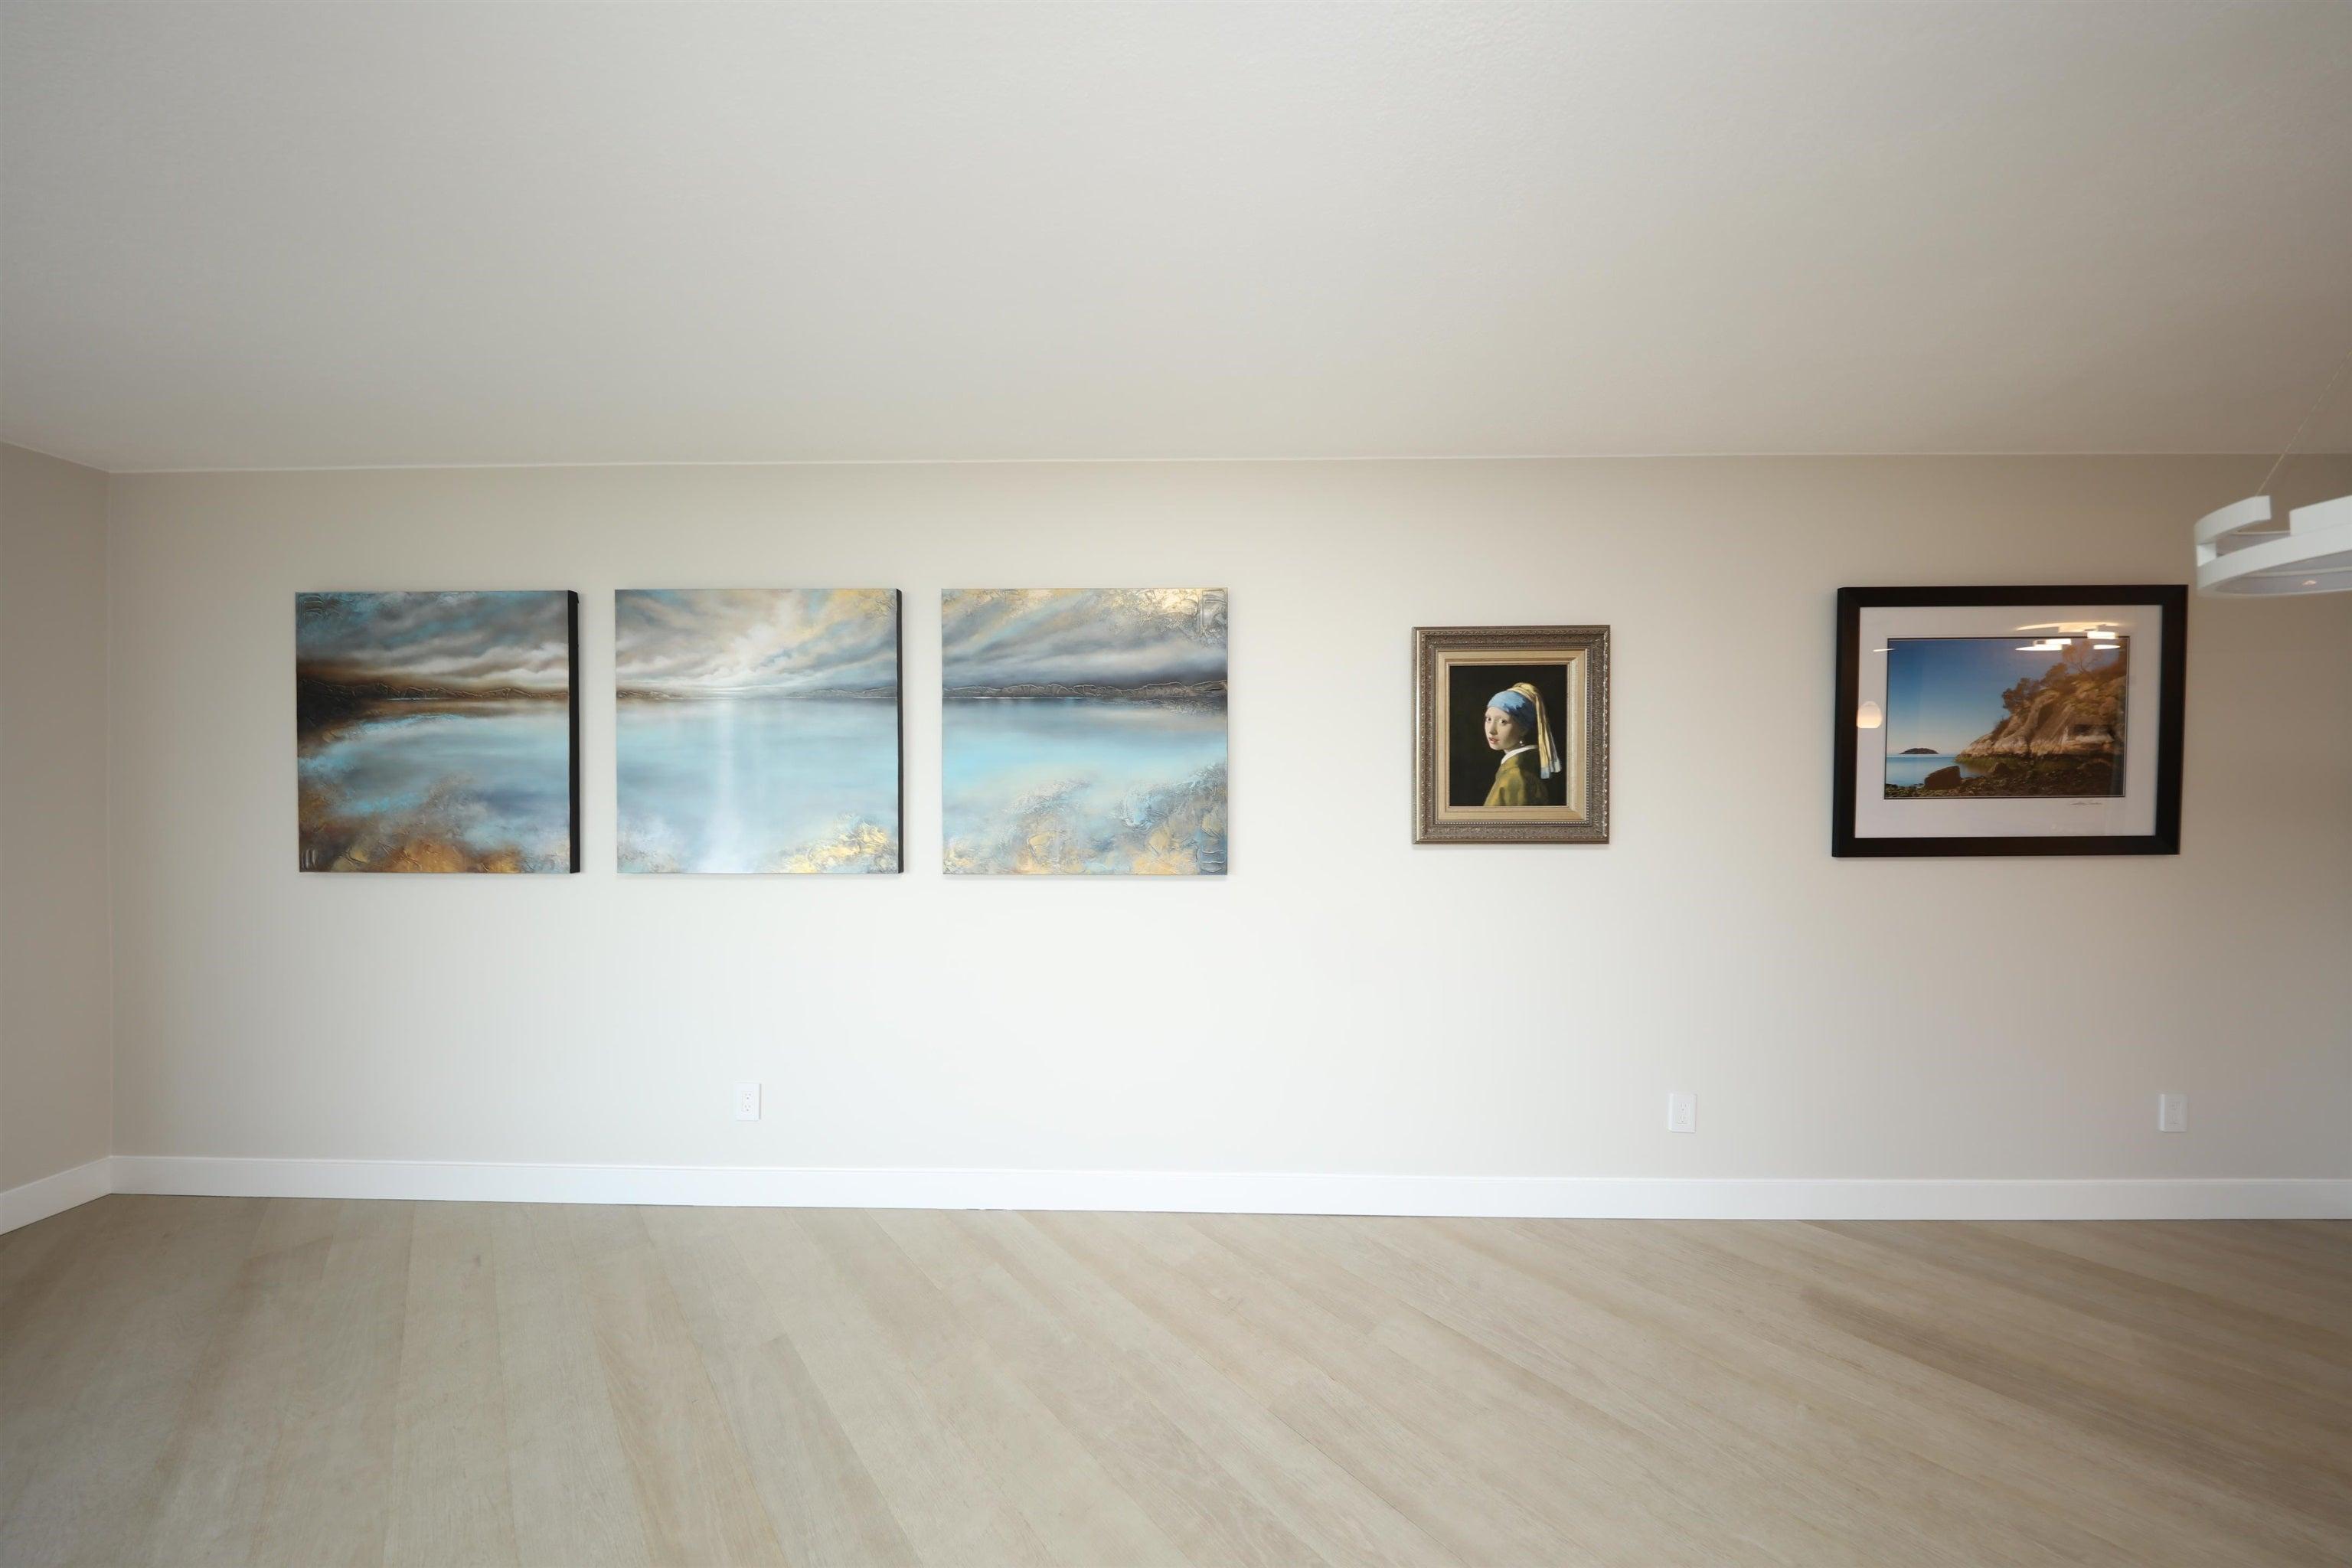 406 1450 PENNYFARTHING DRIVE - False Creek Apartment/Condo for sale, 2 Bedrooms (R2617259) - #29